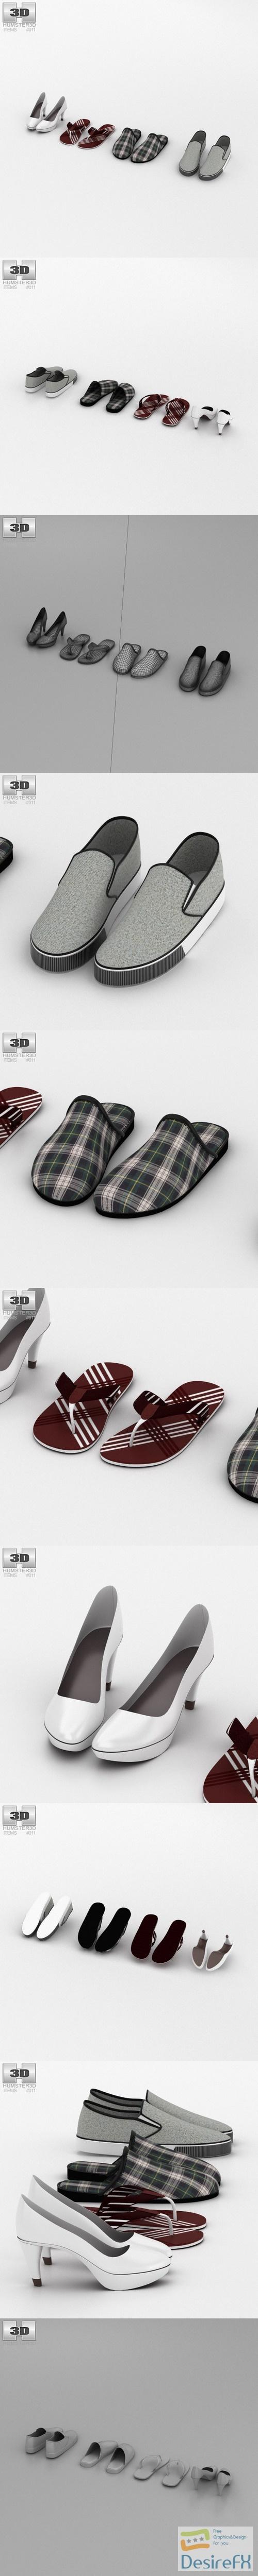 Footwear Summer Set 3D Model